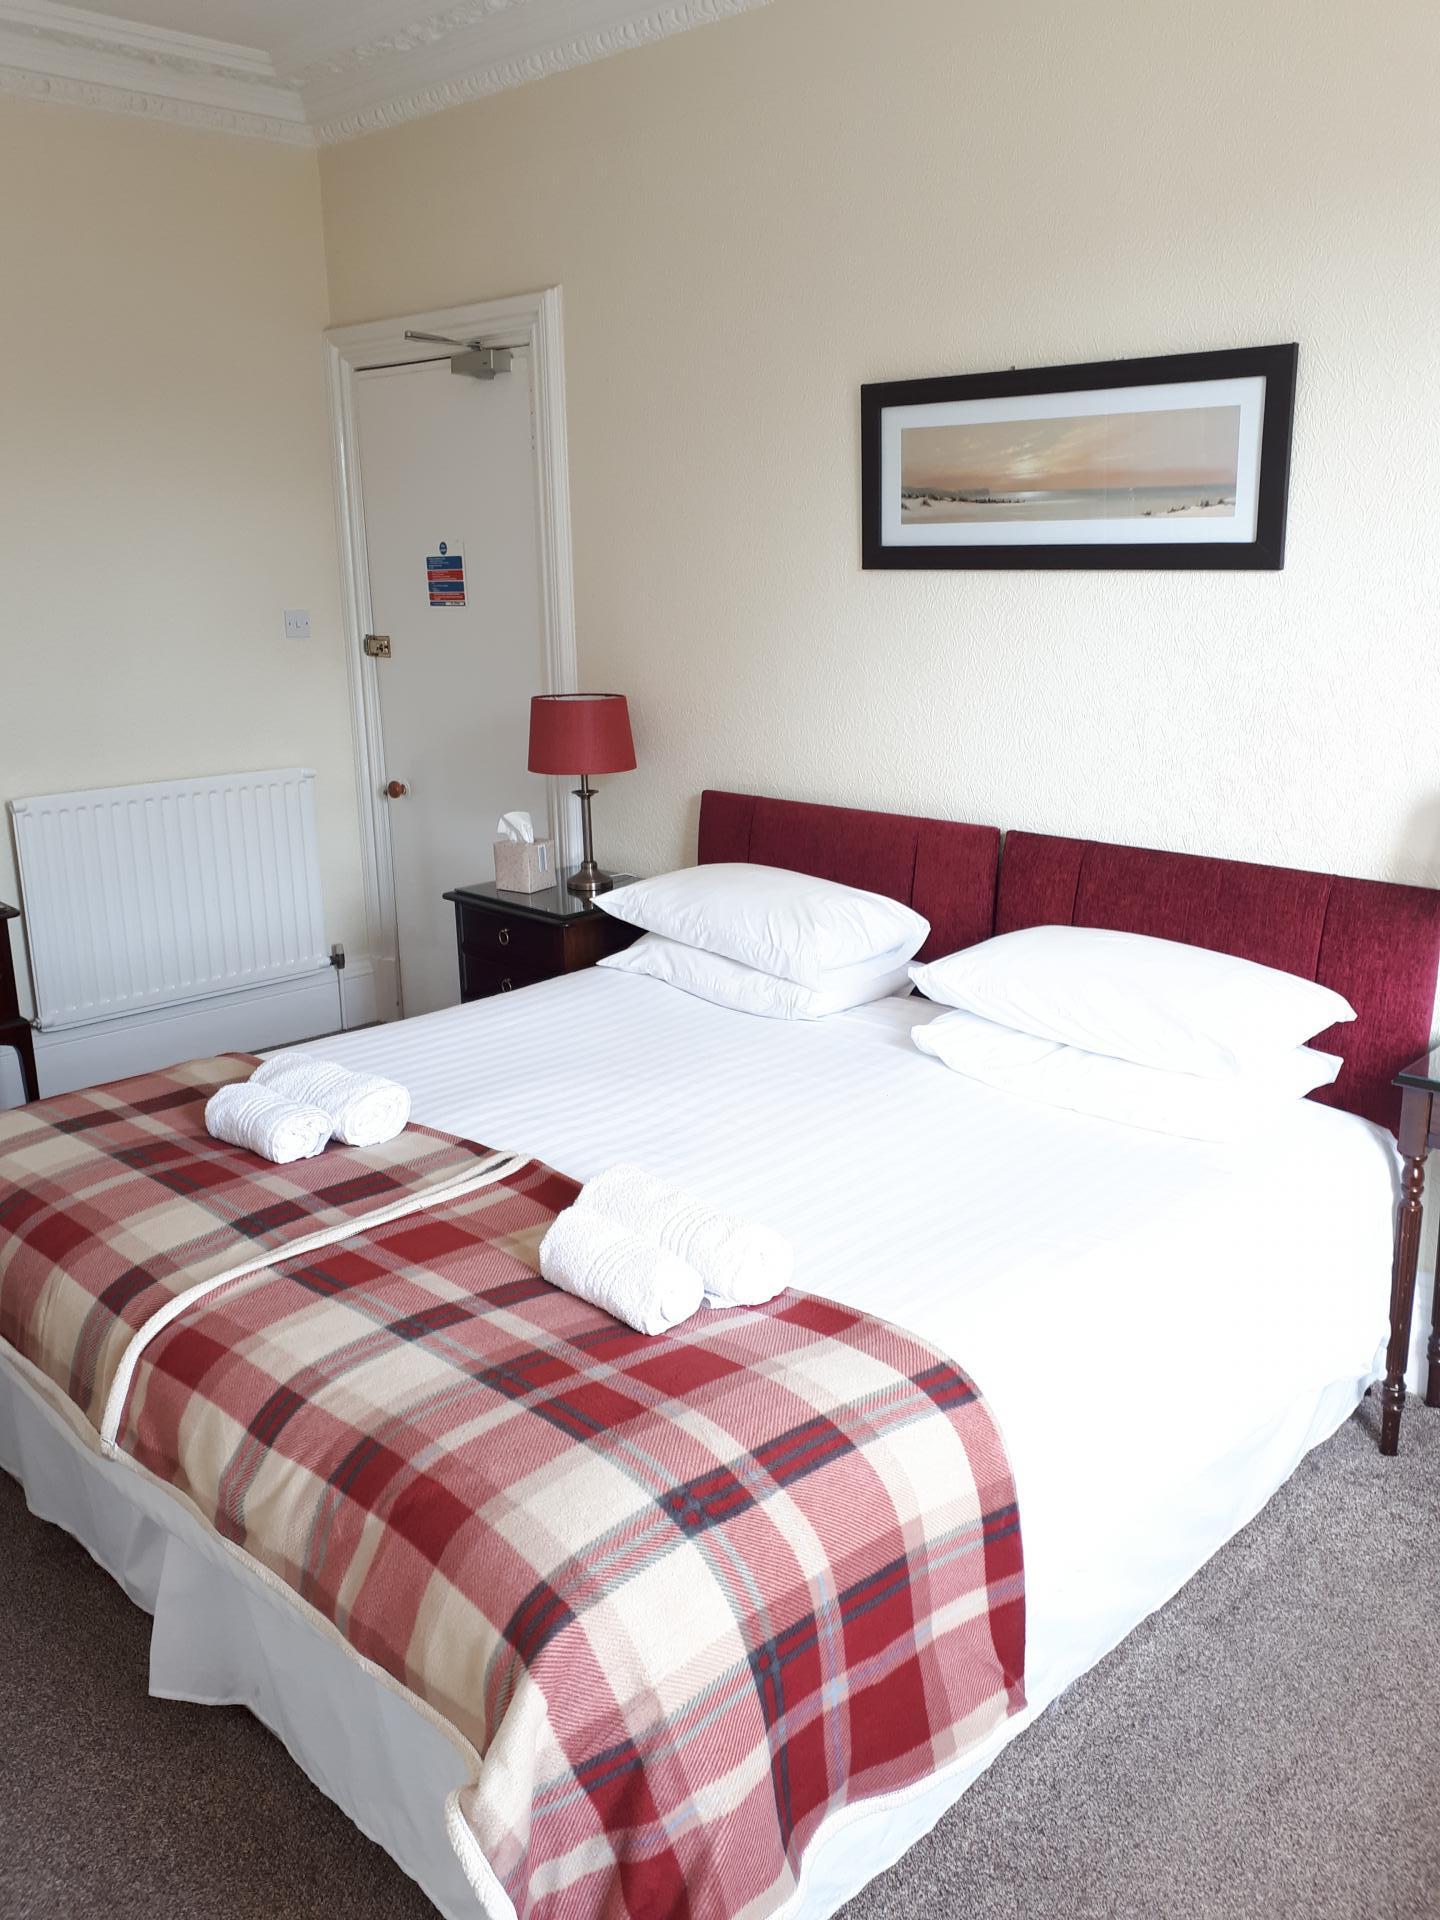 Kingsize Double En-suite Room with City View (inc. Breakfast)